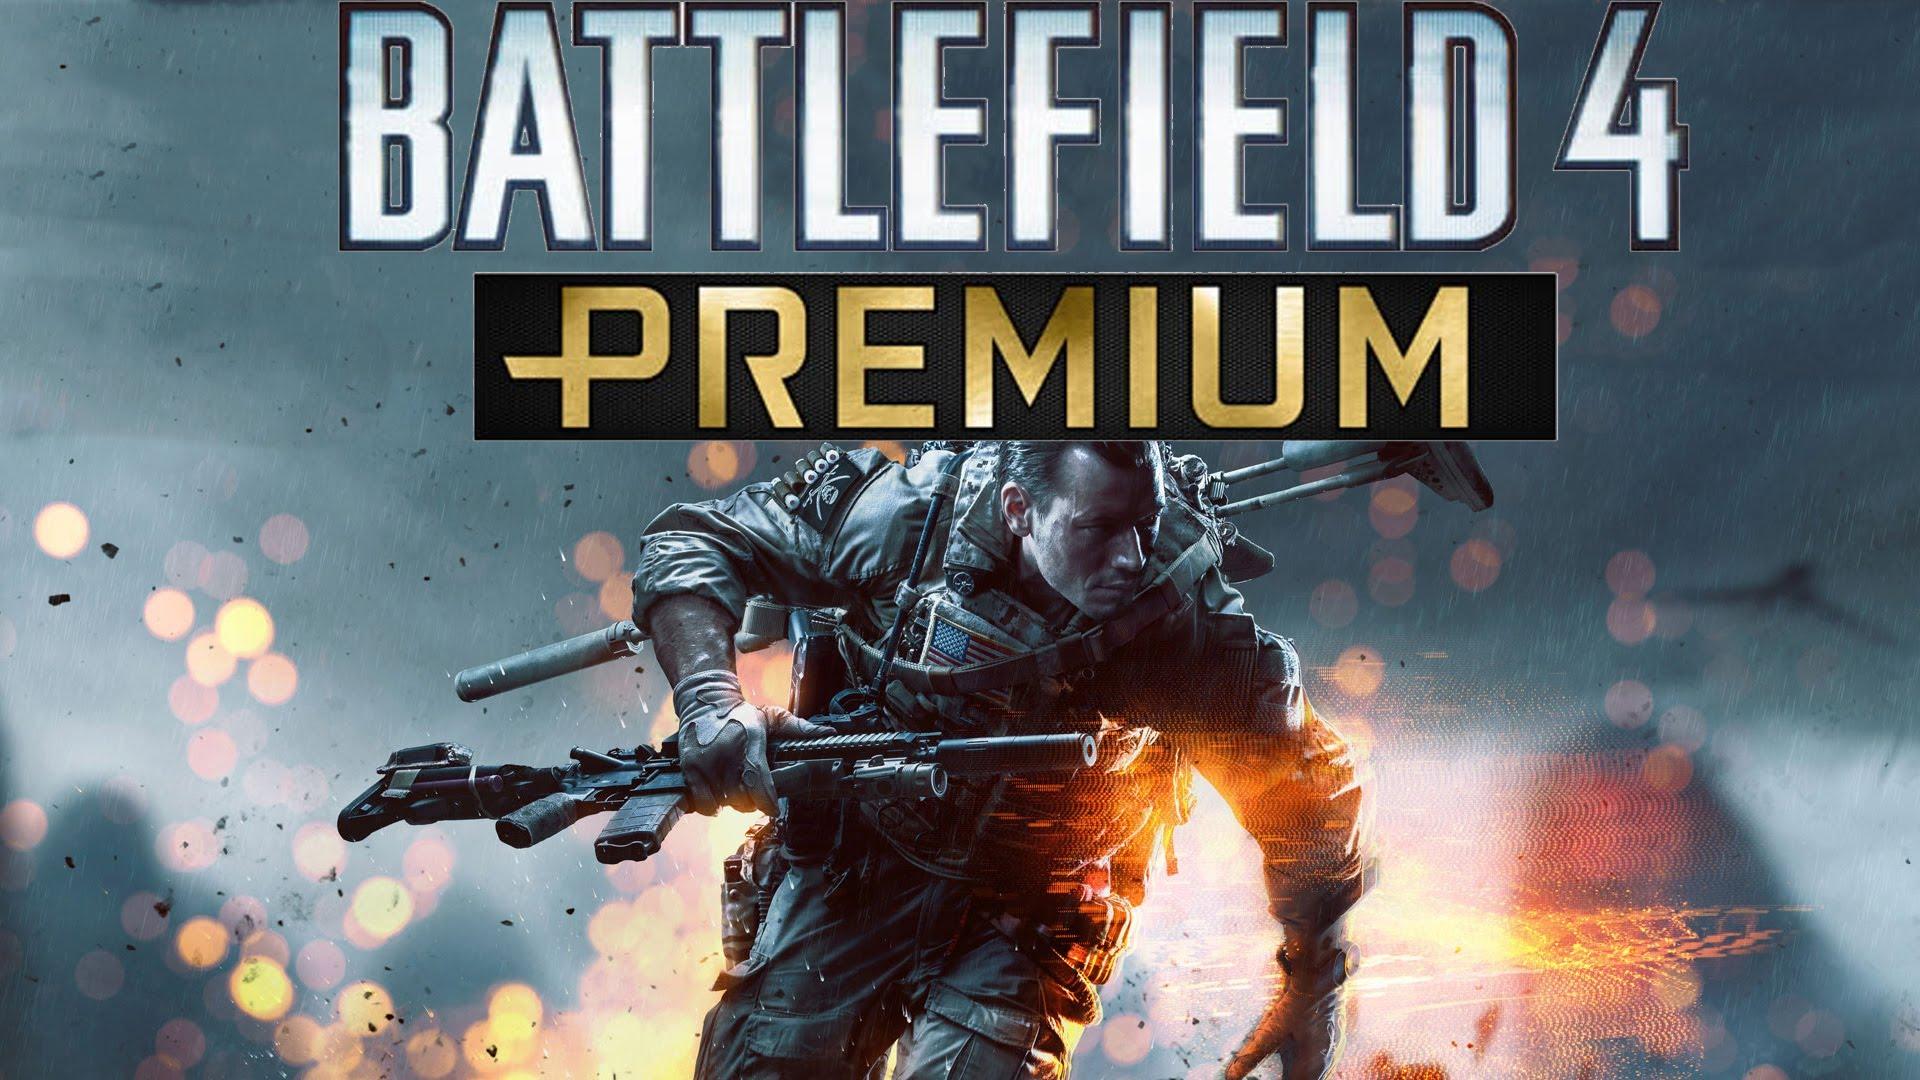 Battlefield 3 Premium + Battlefield 4 Premium [ORIGIN]